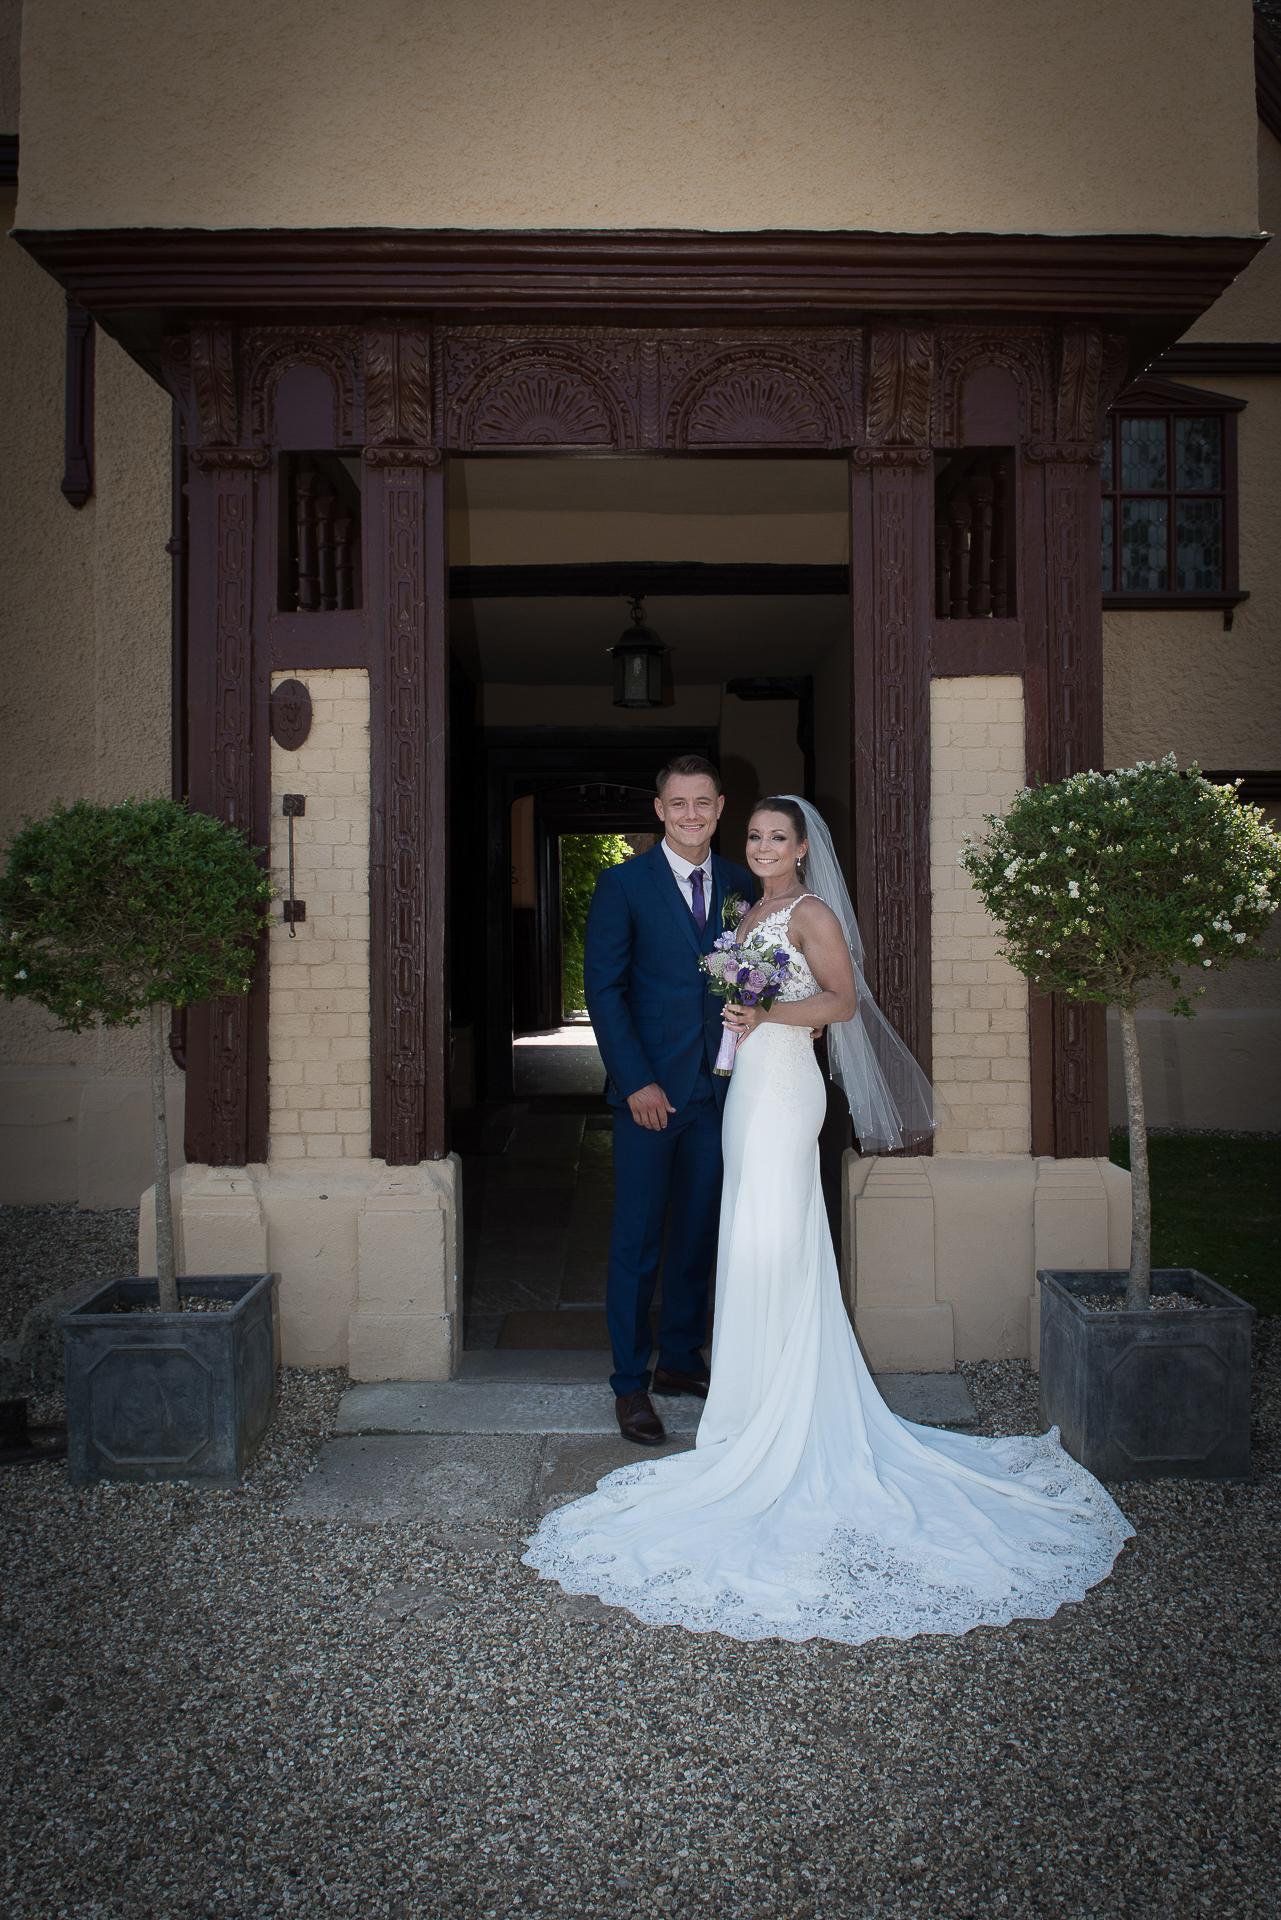 Ufton Court Wedding Photography29.JPG